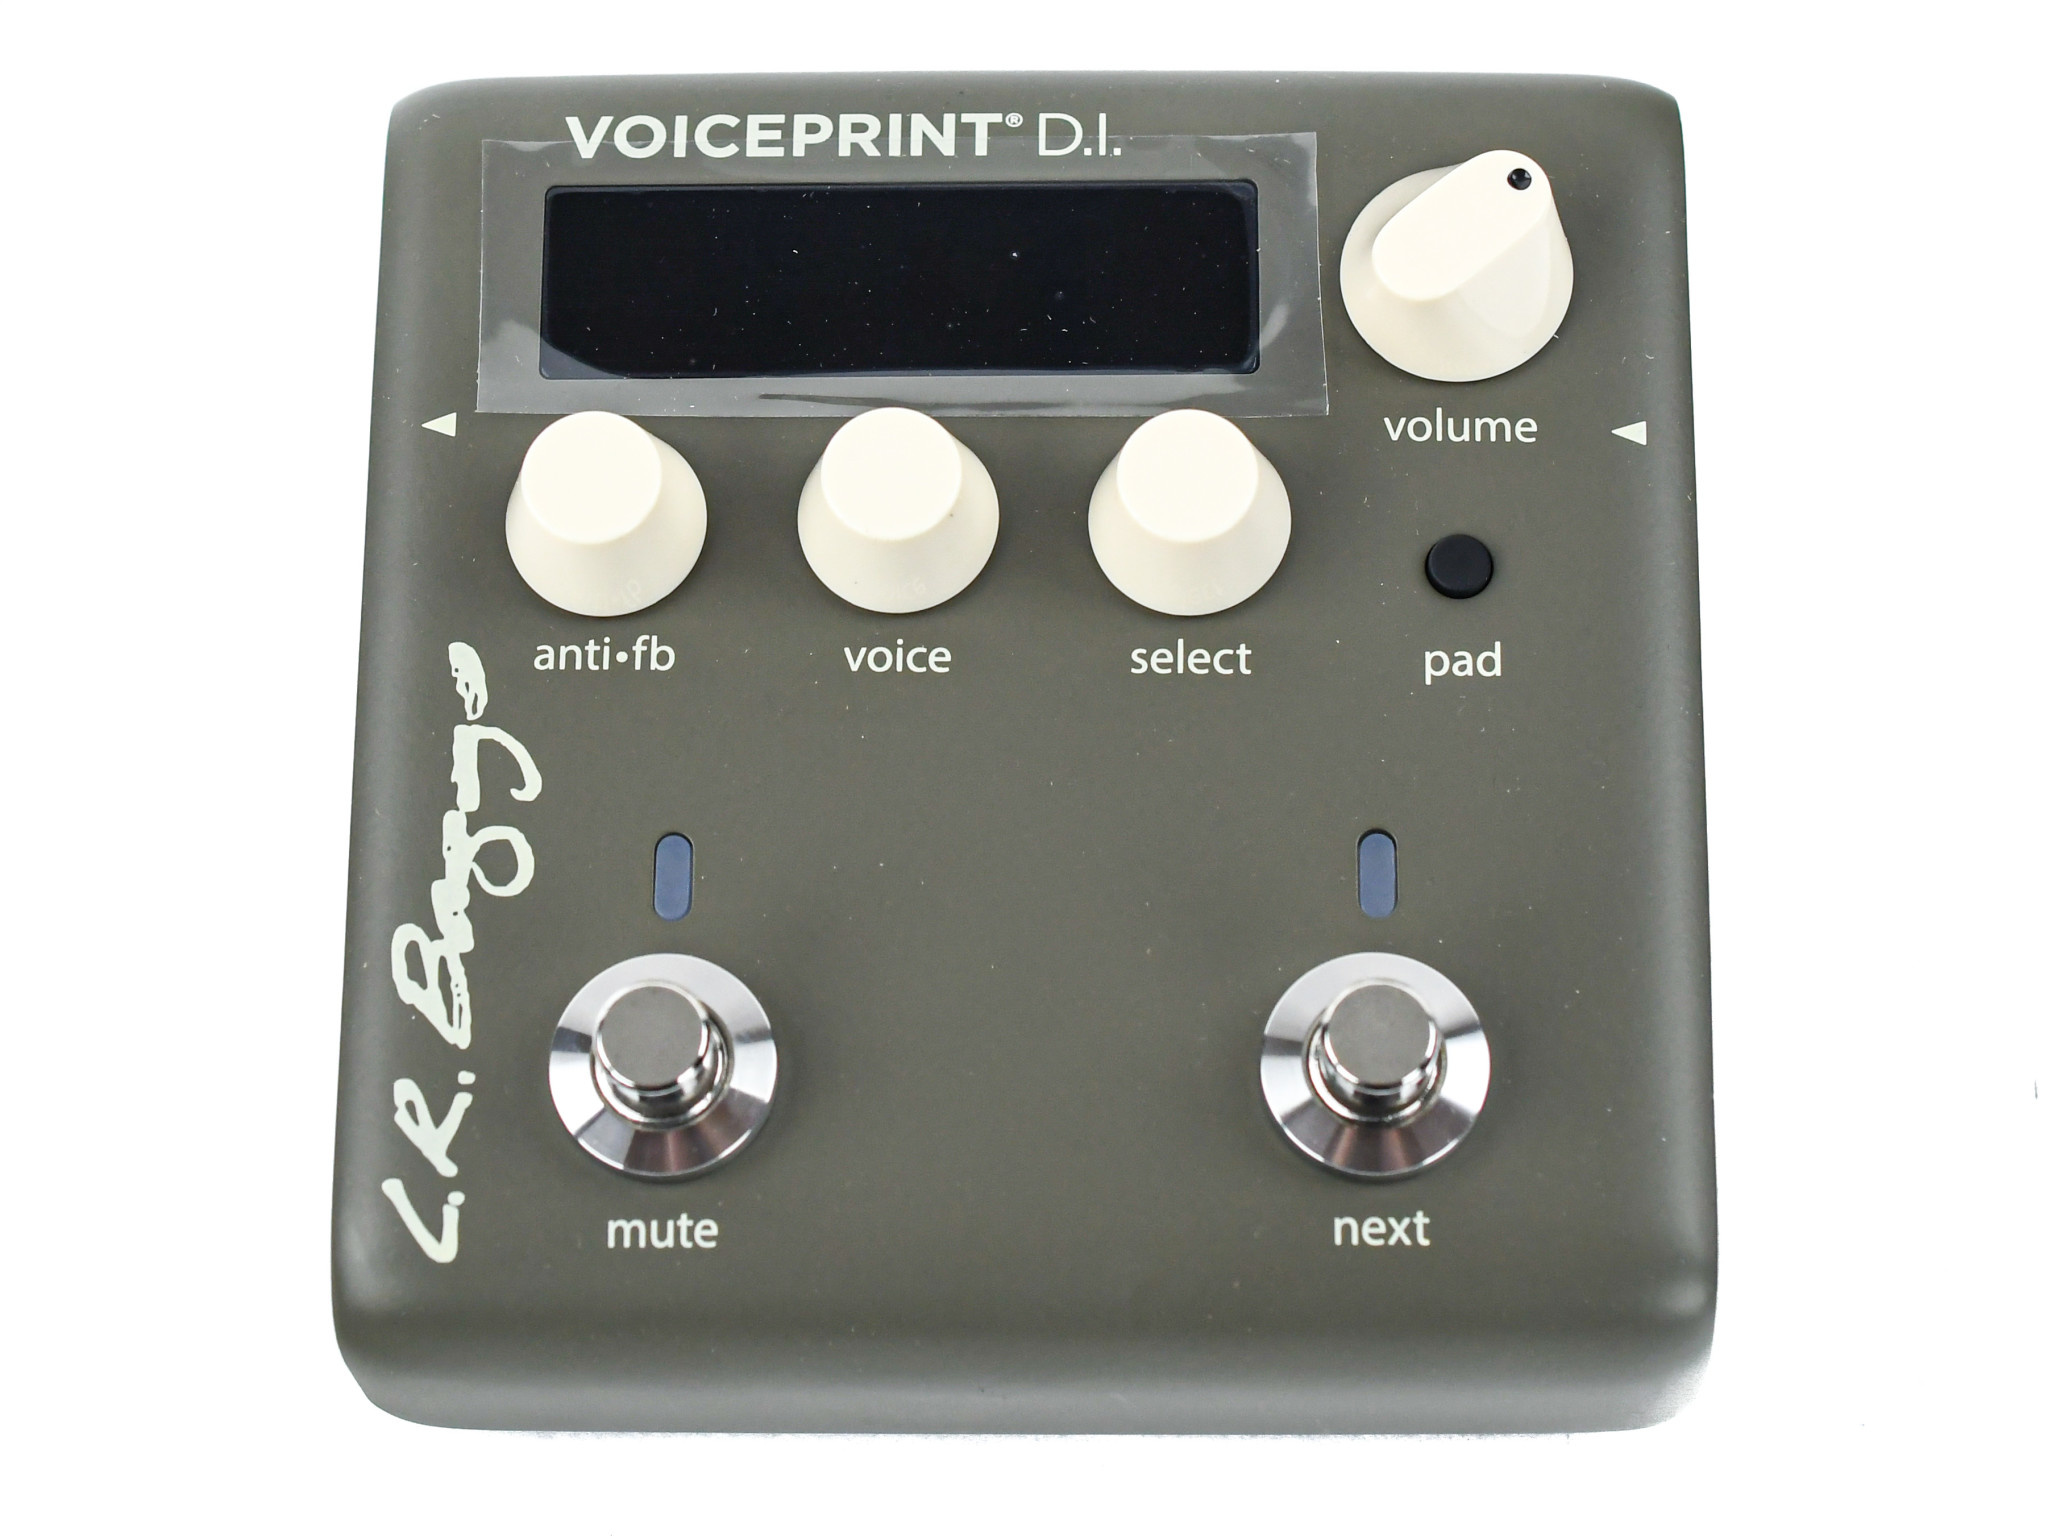 LR Baggs Voiceprint DI